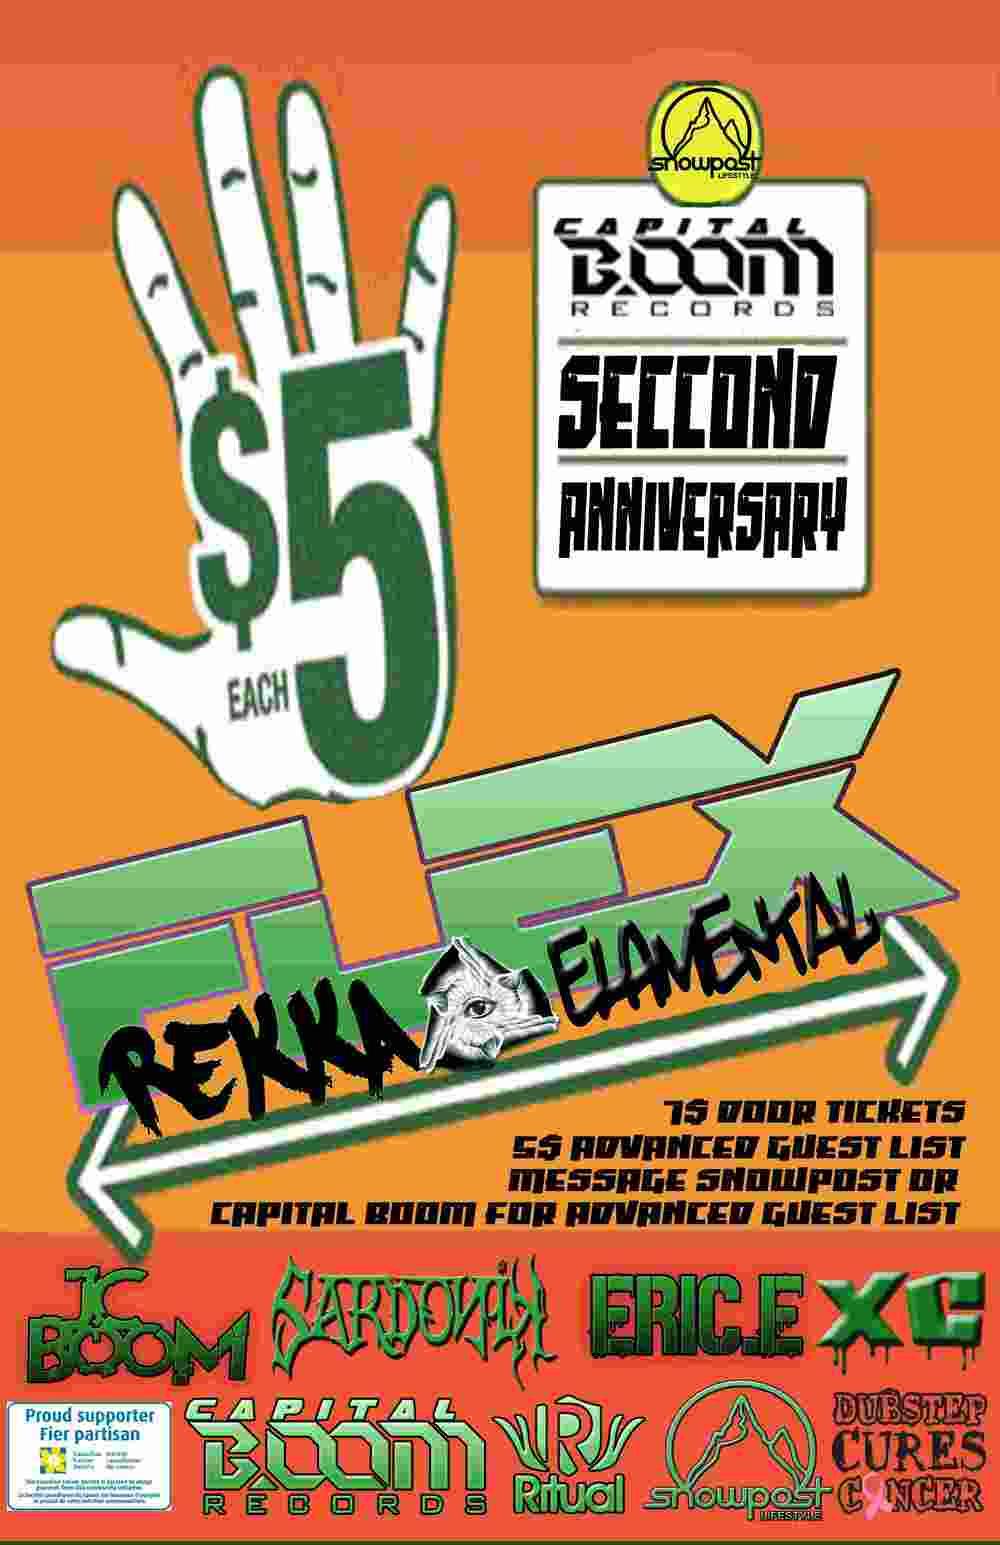 Rekka & ElaMental, JC Boom, Sardonik, Eric E, XC Ritual Nightclub Ottawa